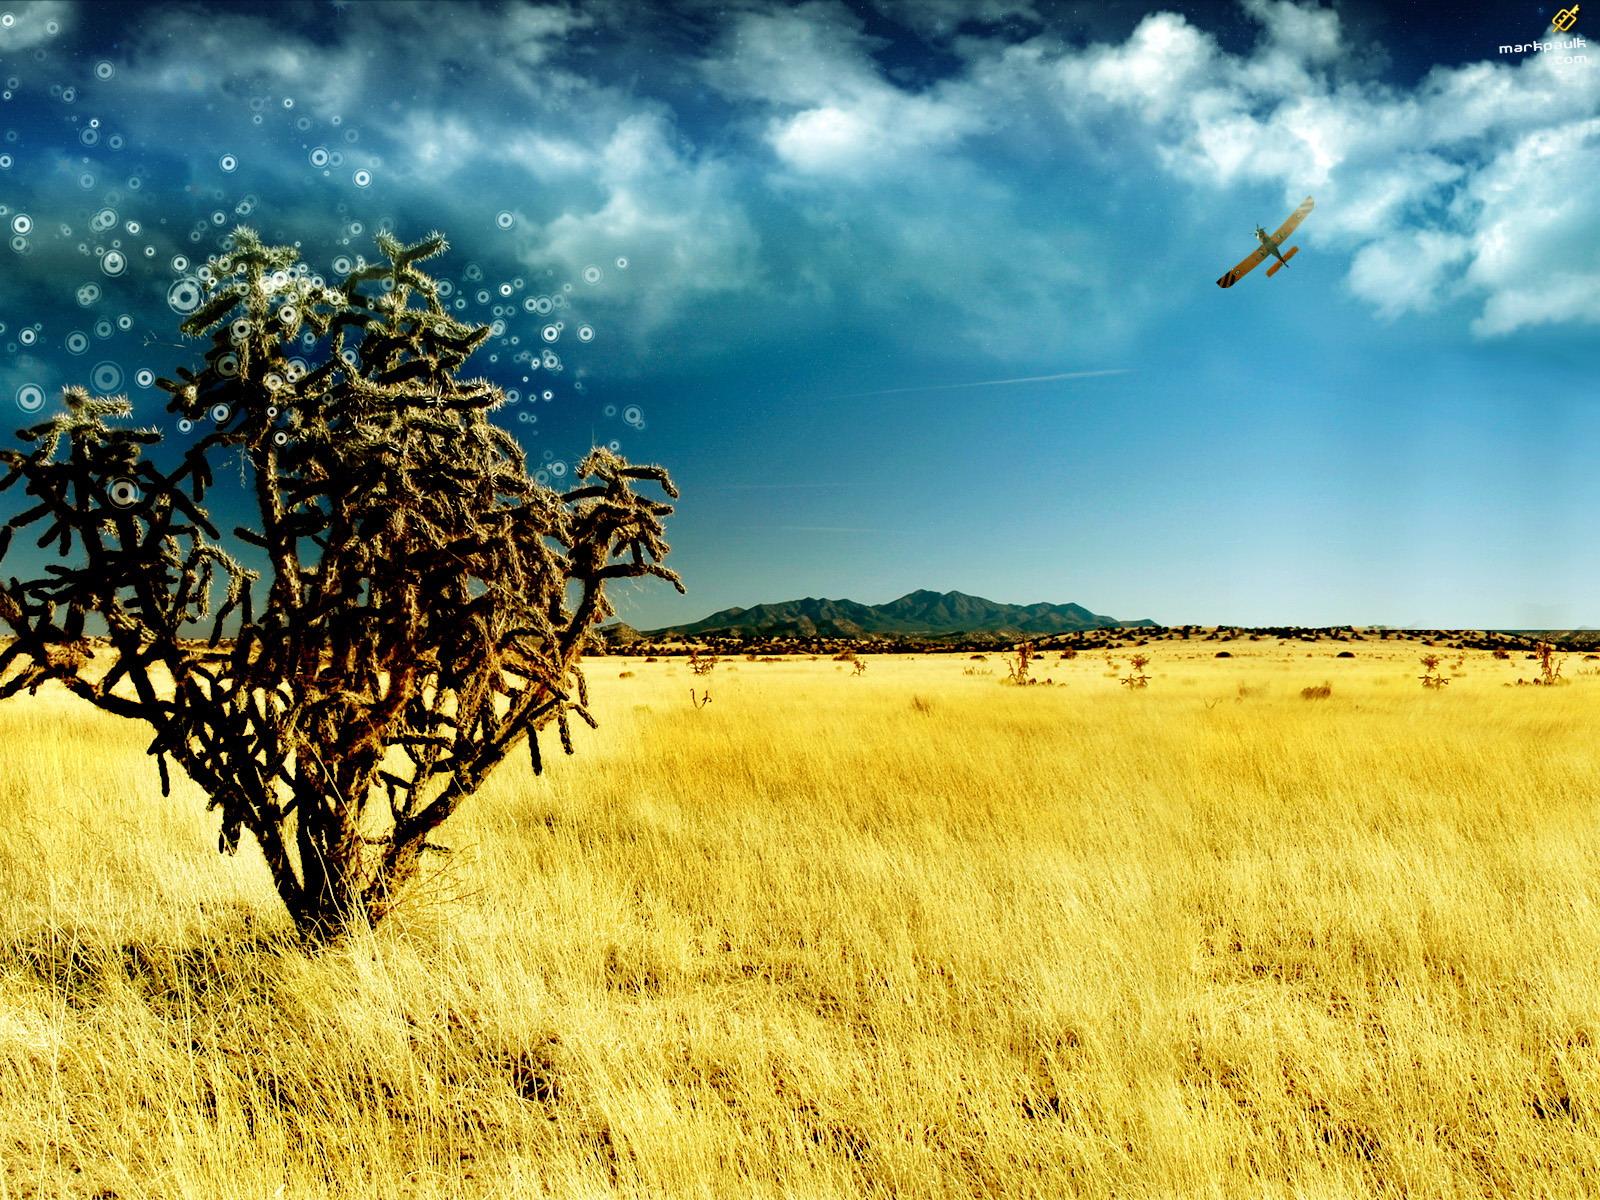 tree desktop background - photo #33